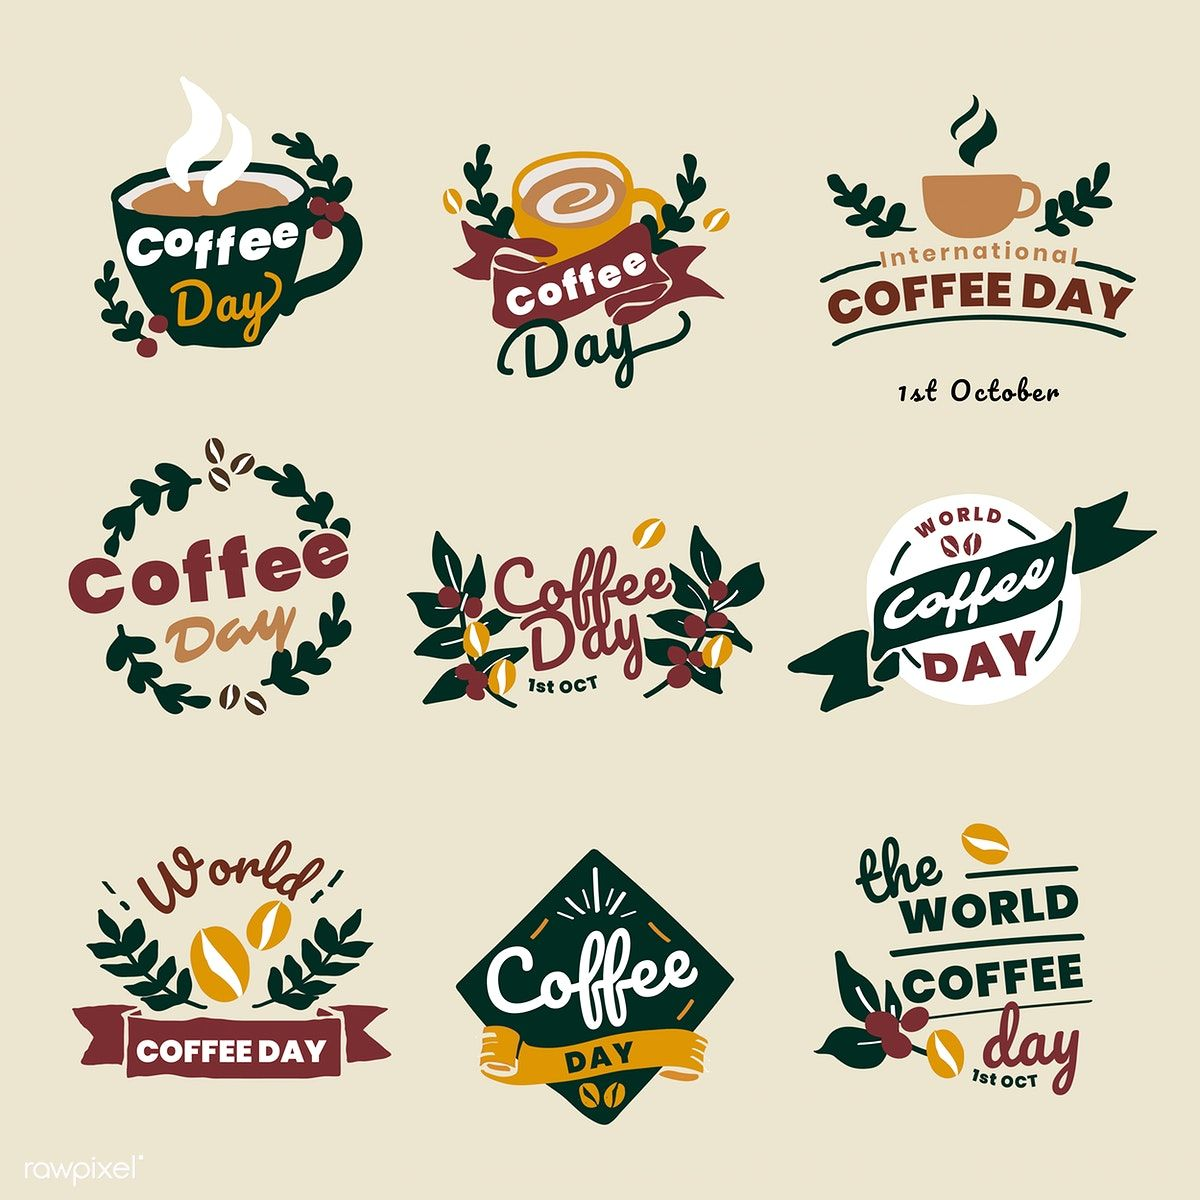 Download premium vector of International coffee day logo